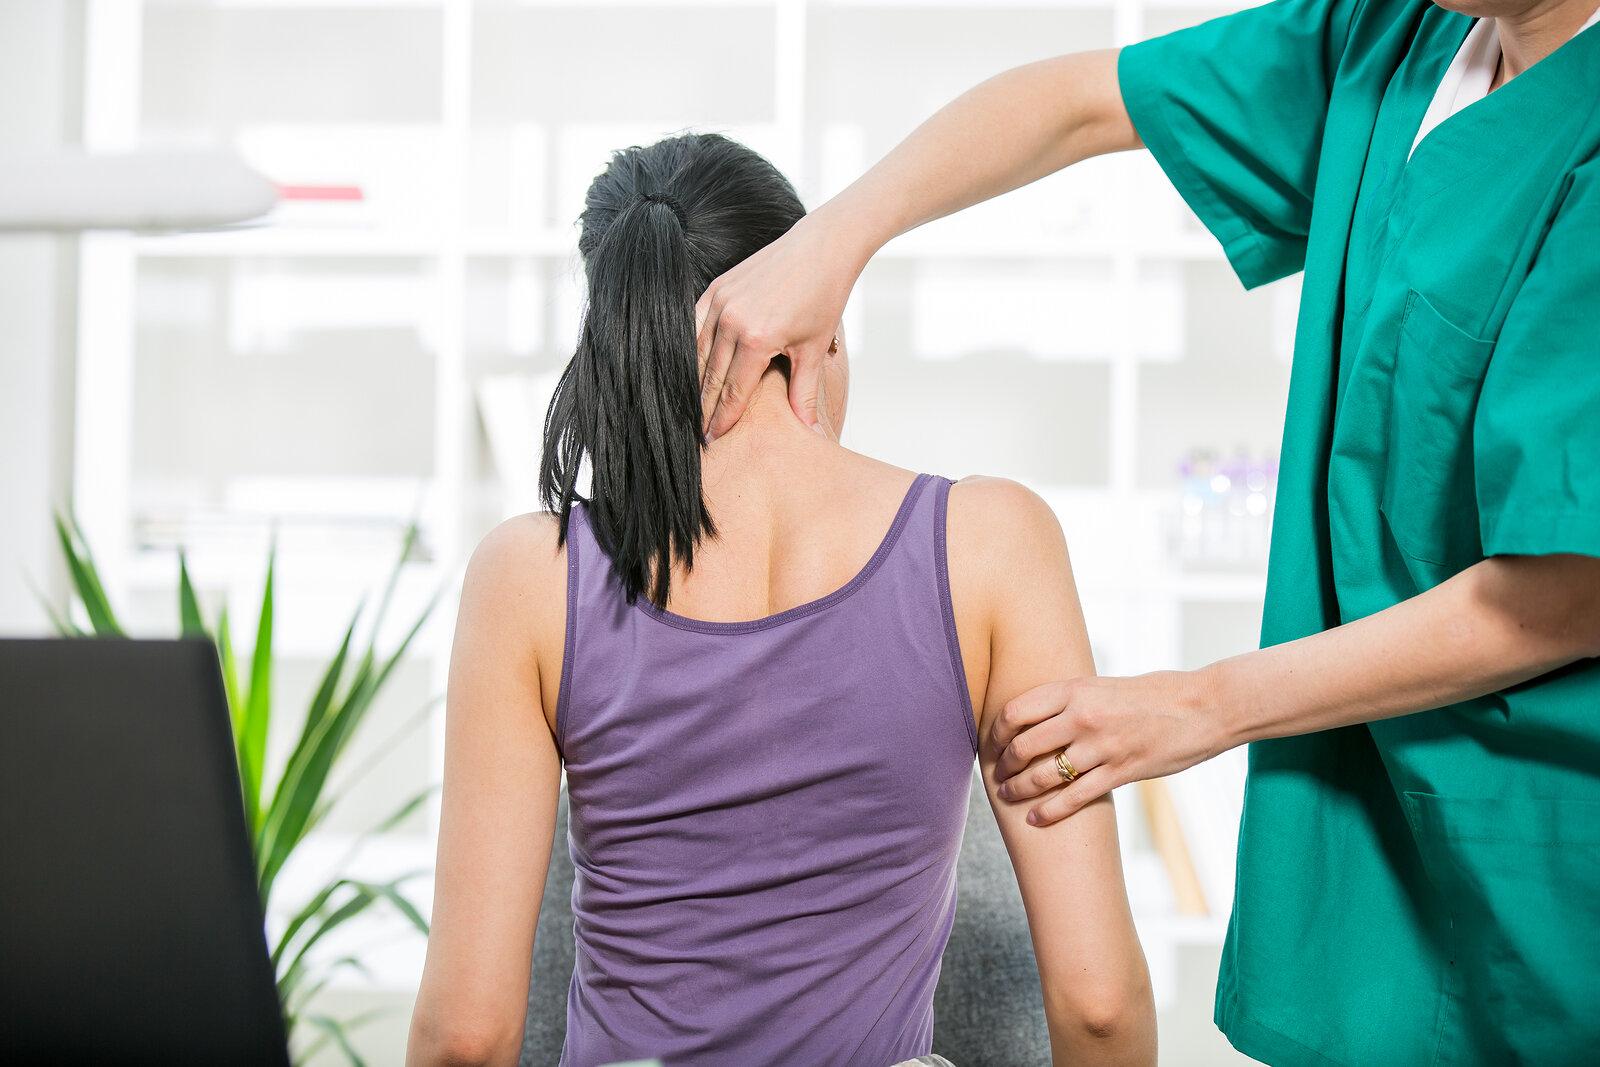 bigstock-Chiropractor-adjusting-neck-mu-86076053.jpg